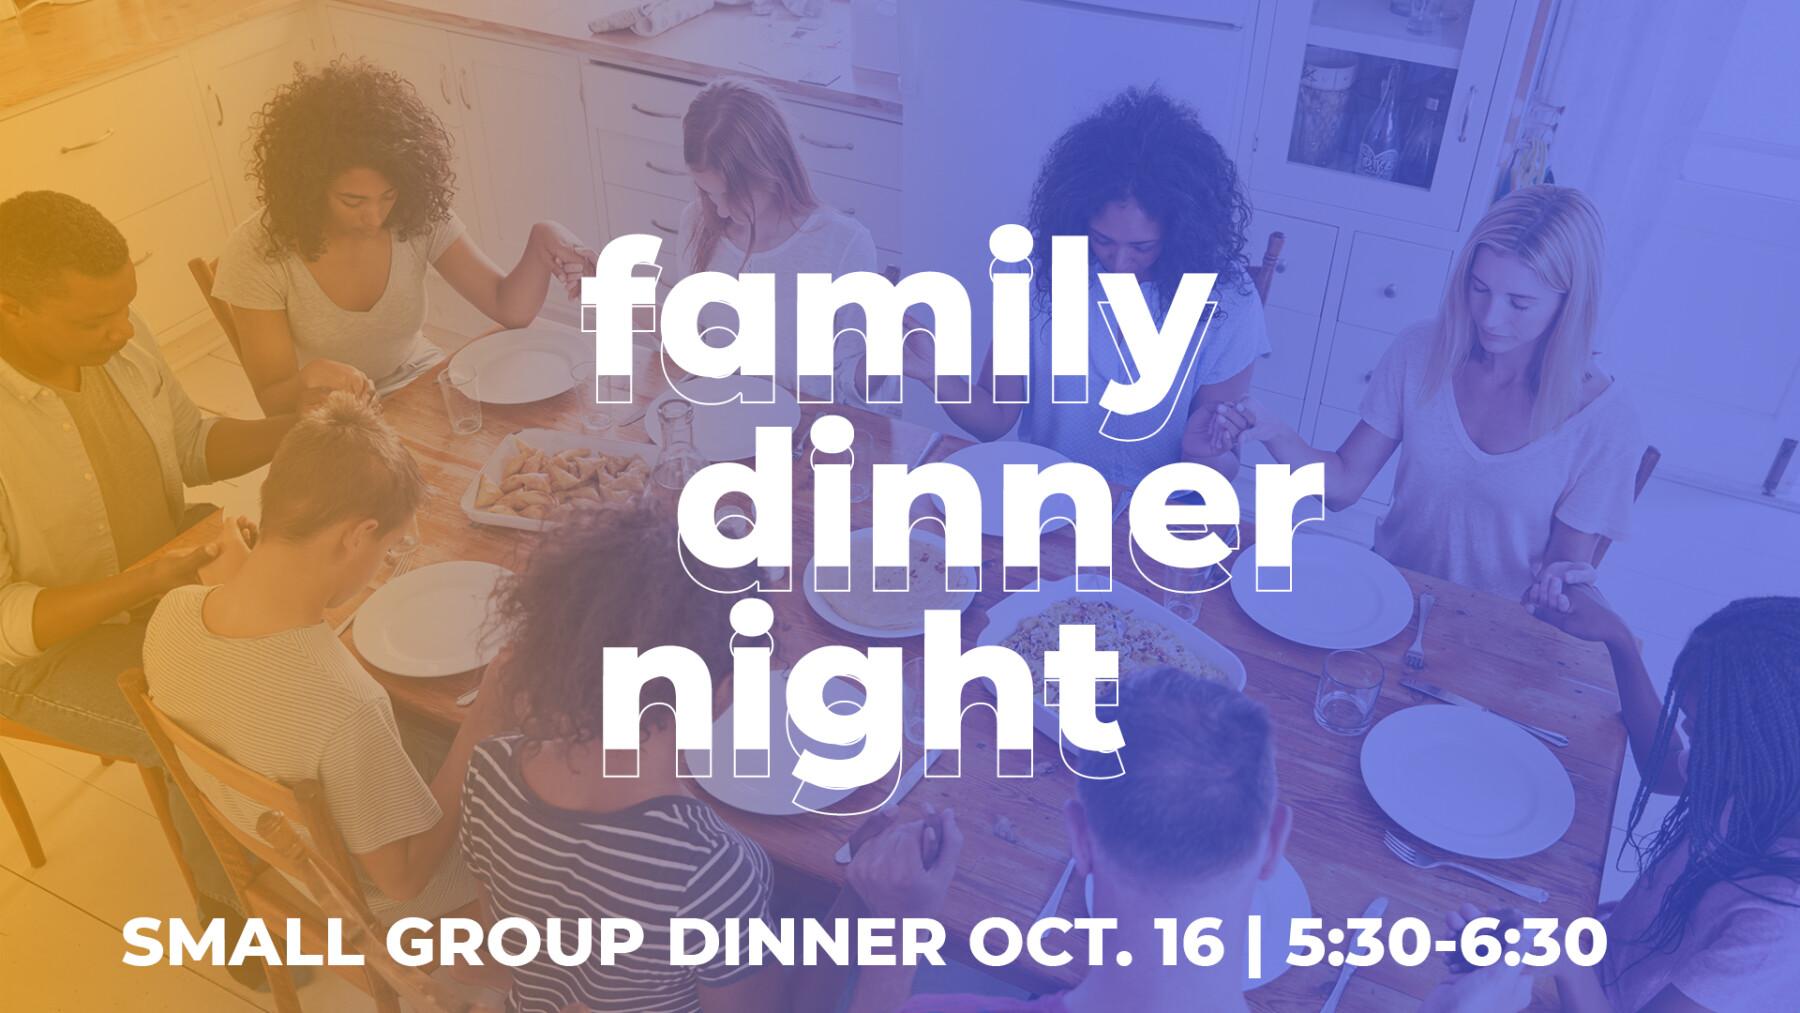 SMALL GROUPS DINNER NIGHT